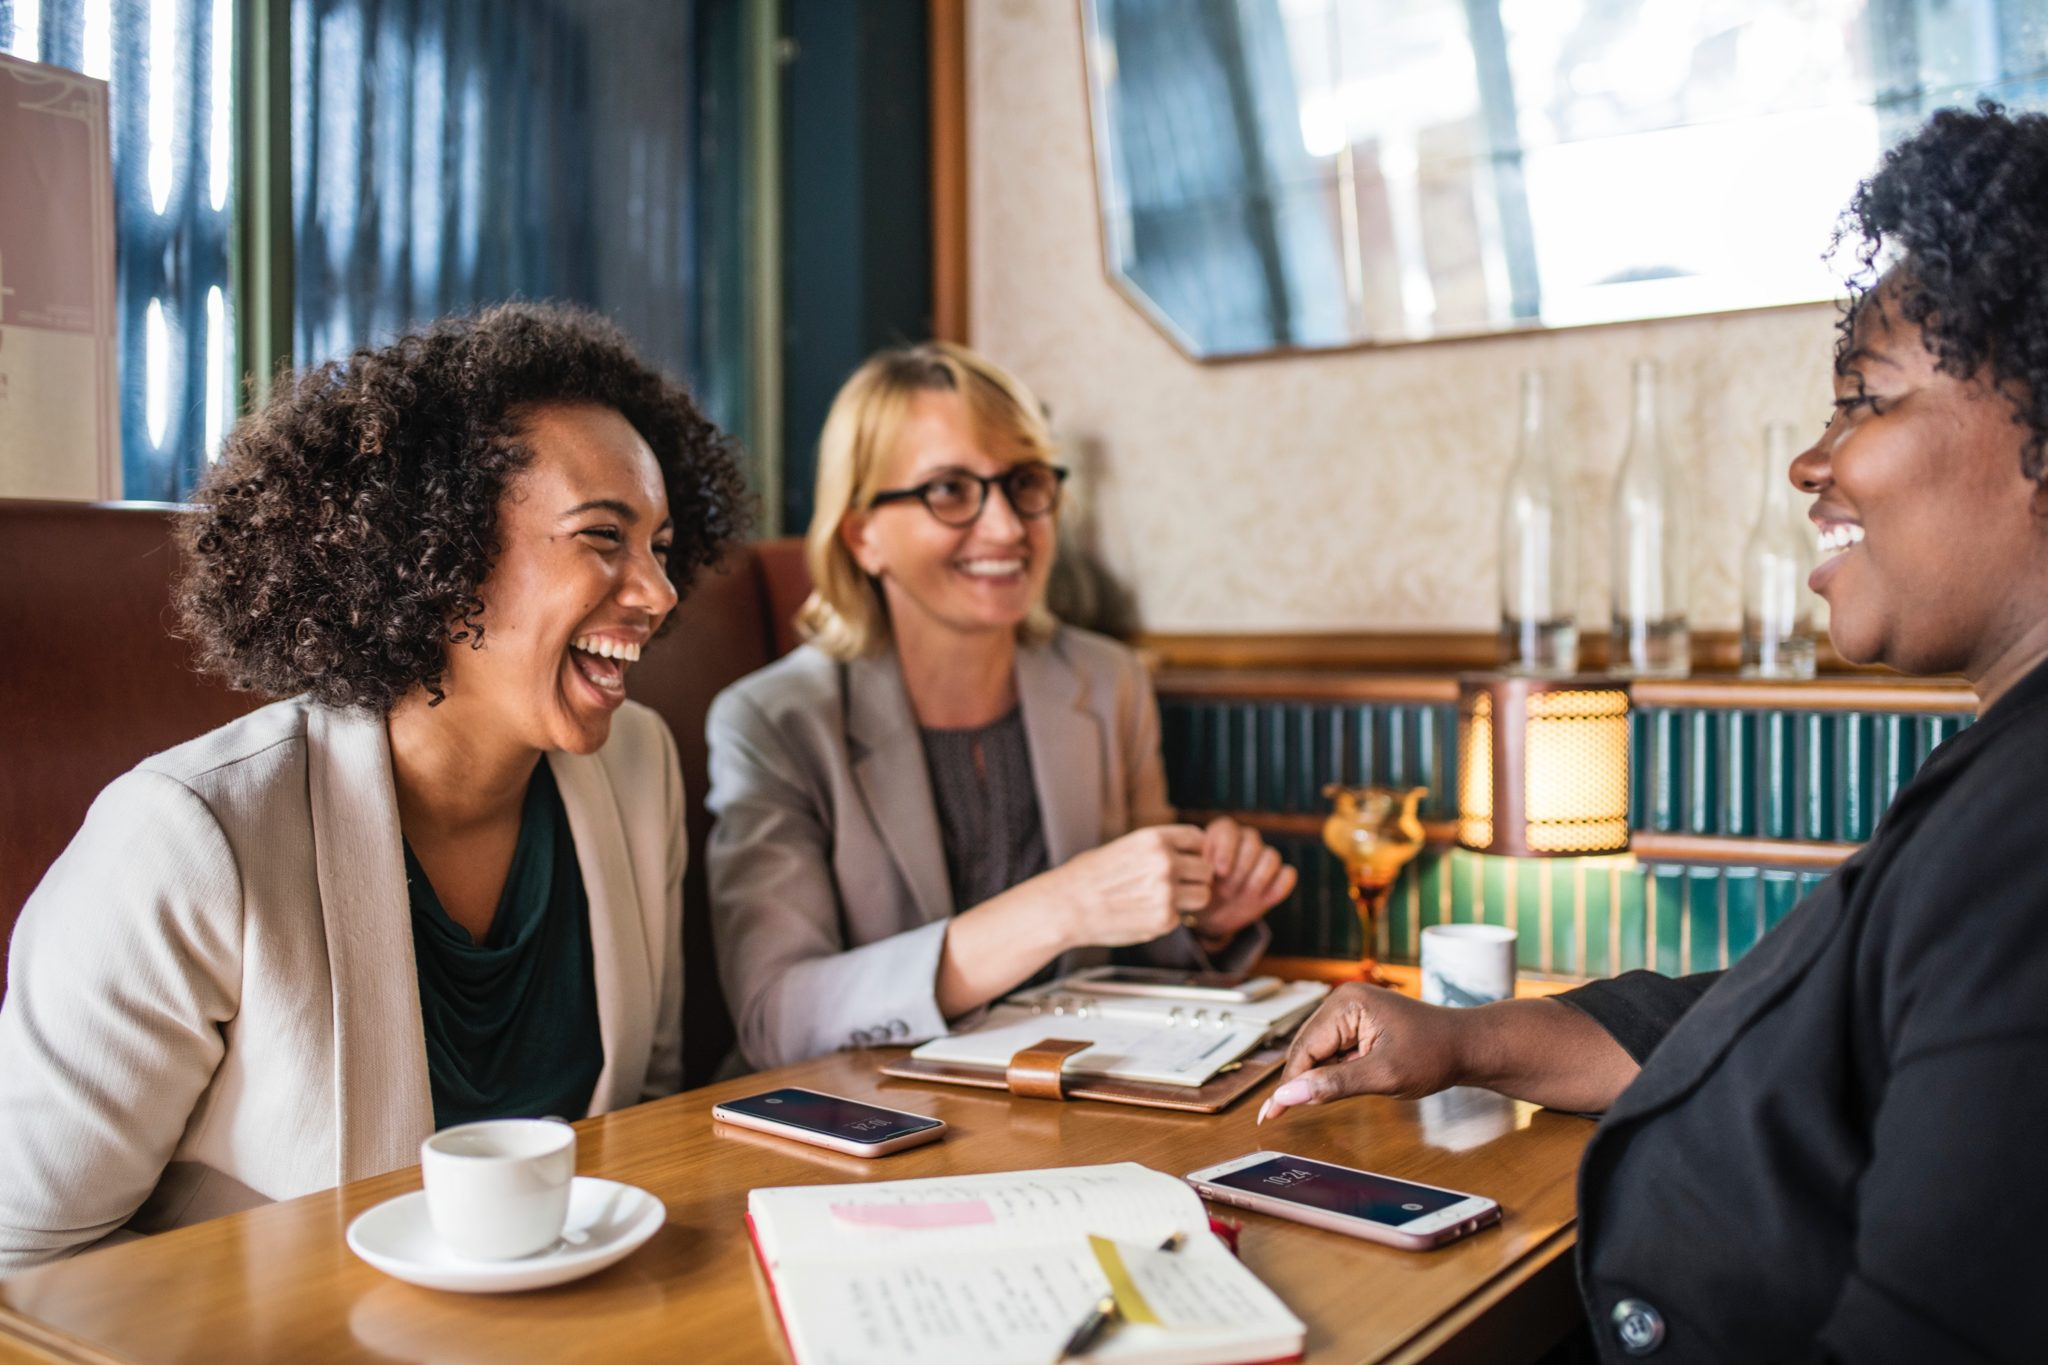 professionals-having-fun-conversation